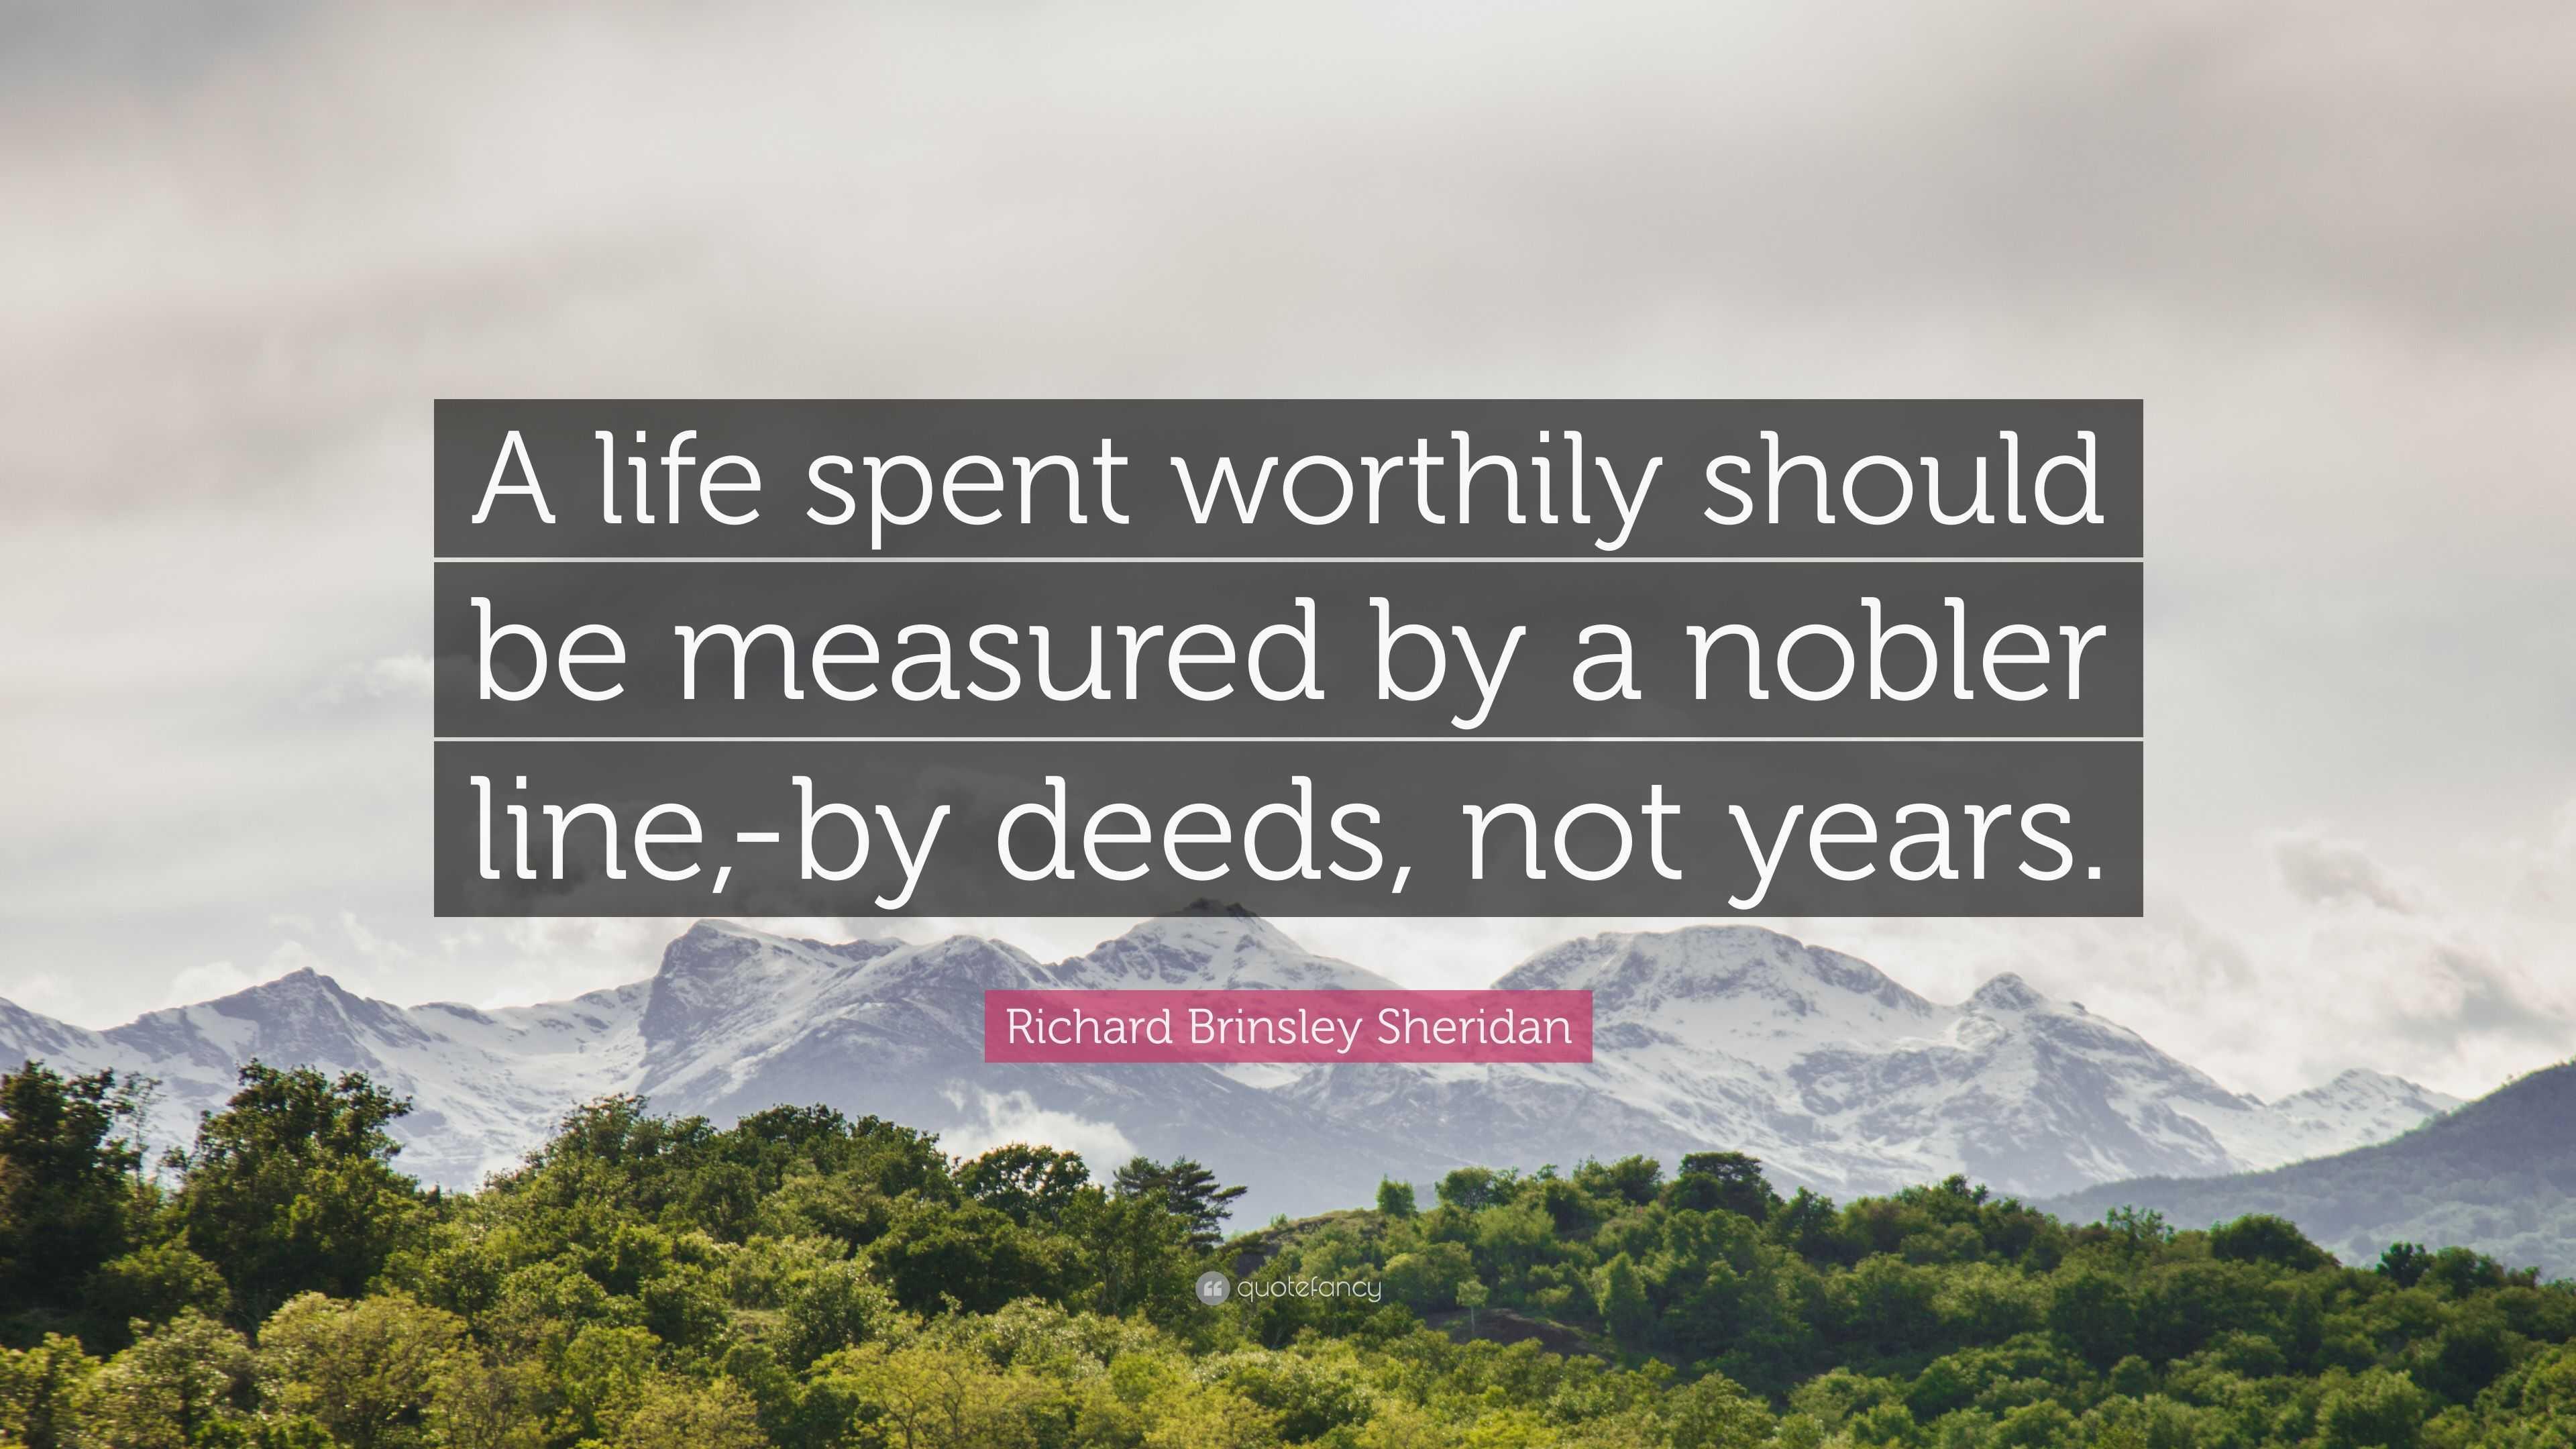 life is measured in deeds not in years